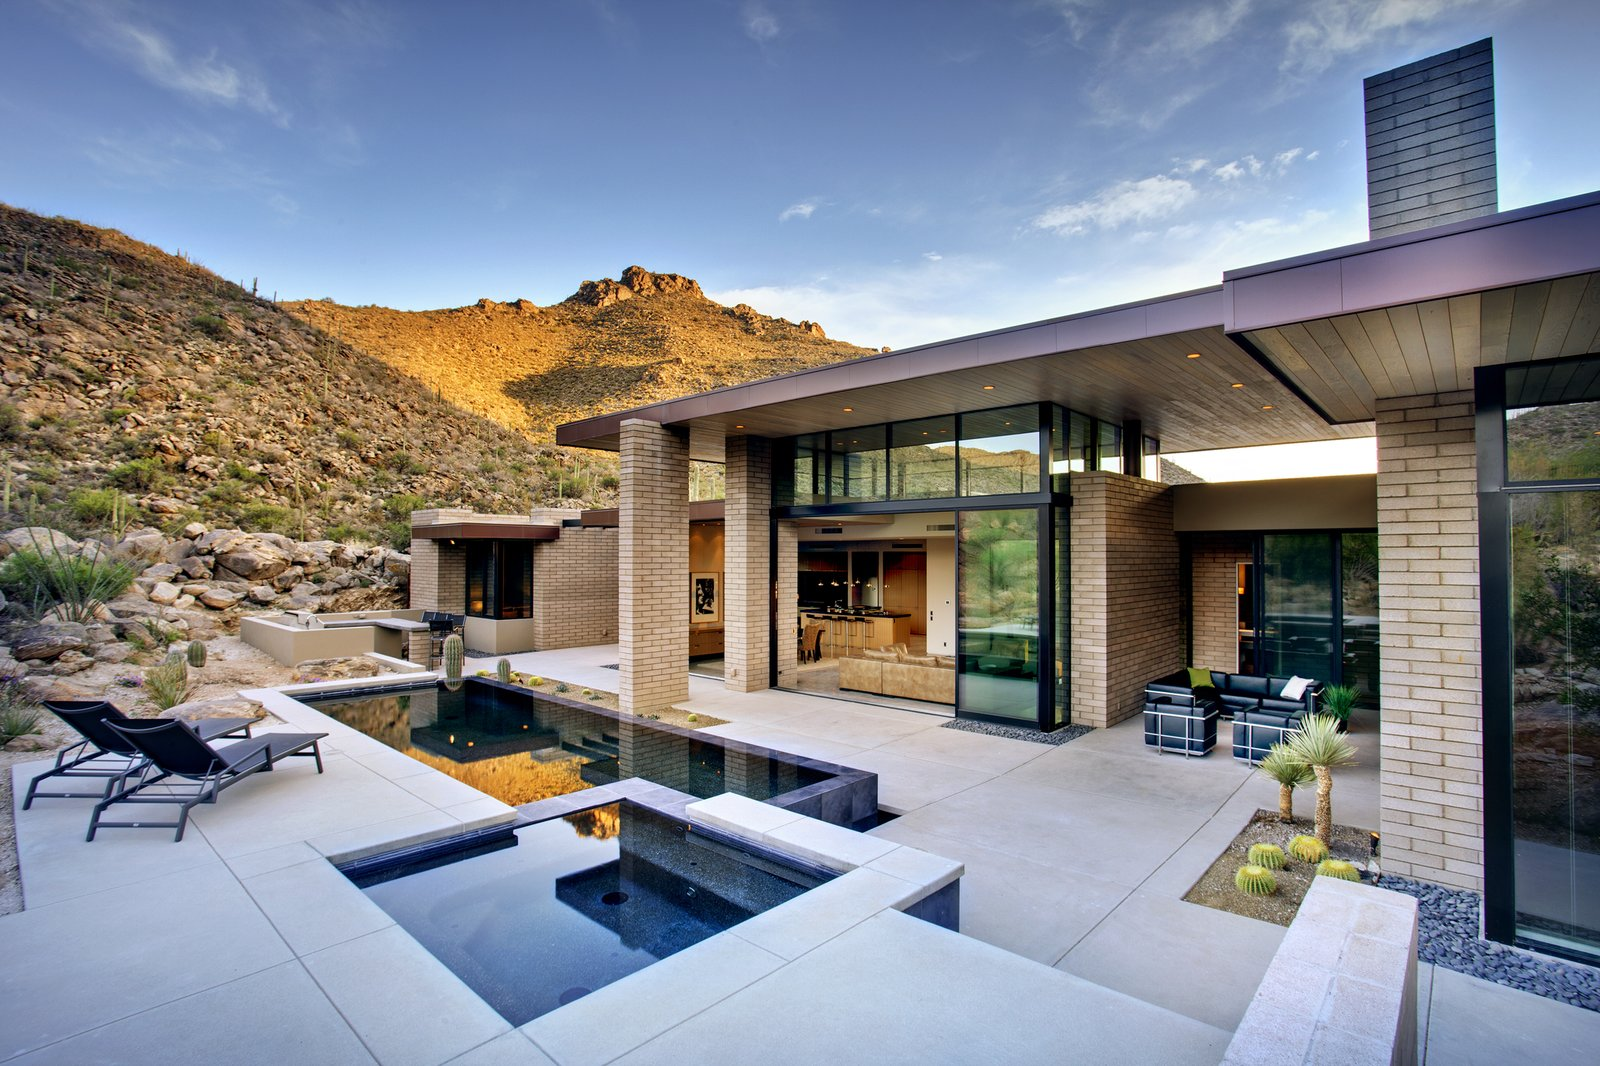 desert mountain home modern home in tucson  arizona by kevin b howard u2026 on dwell